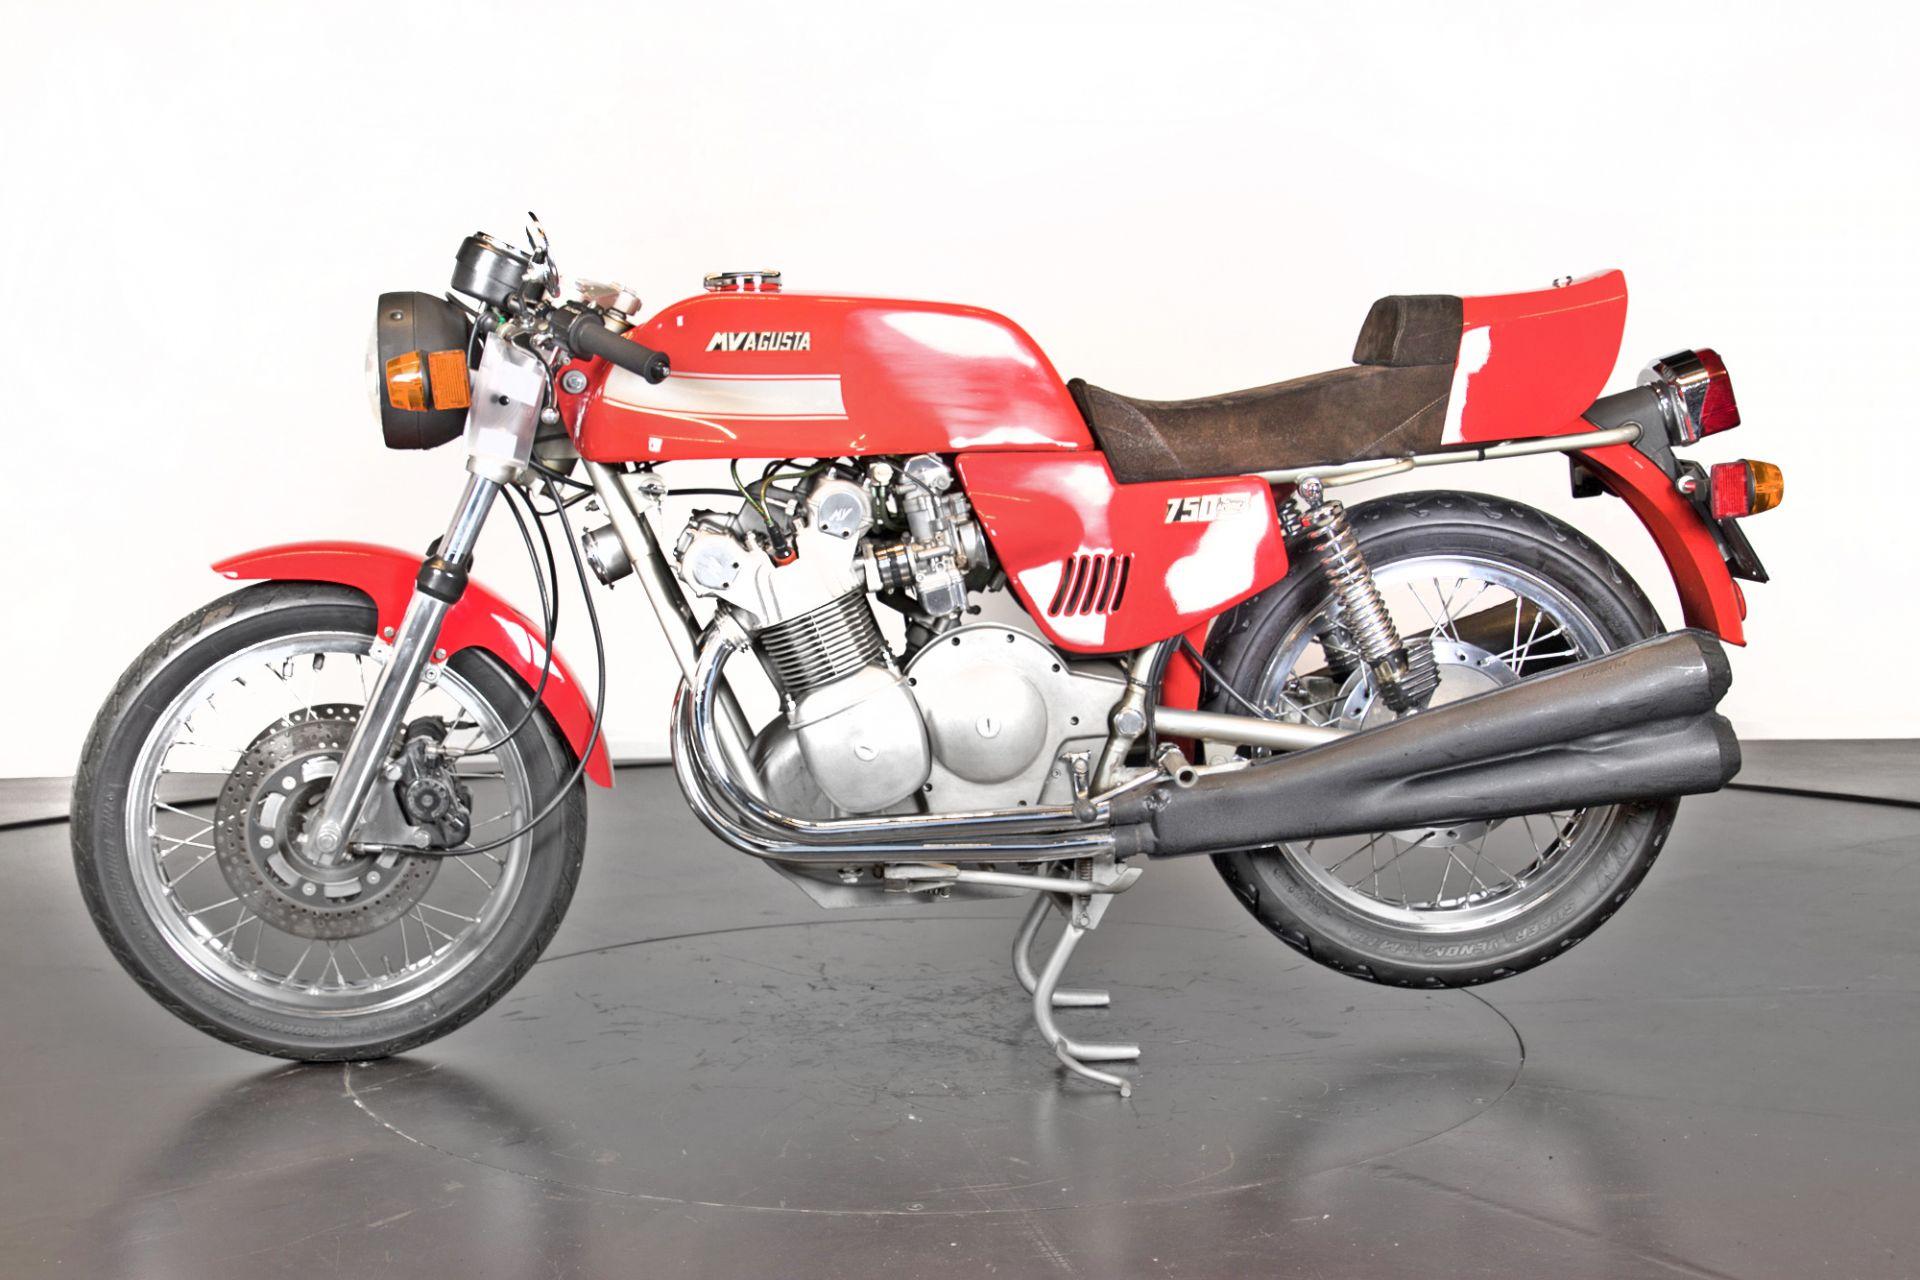 1976 MV Agusta 750 America 35413